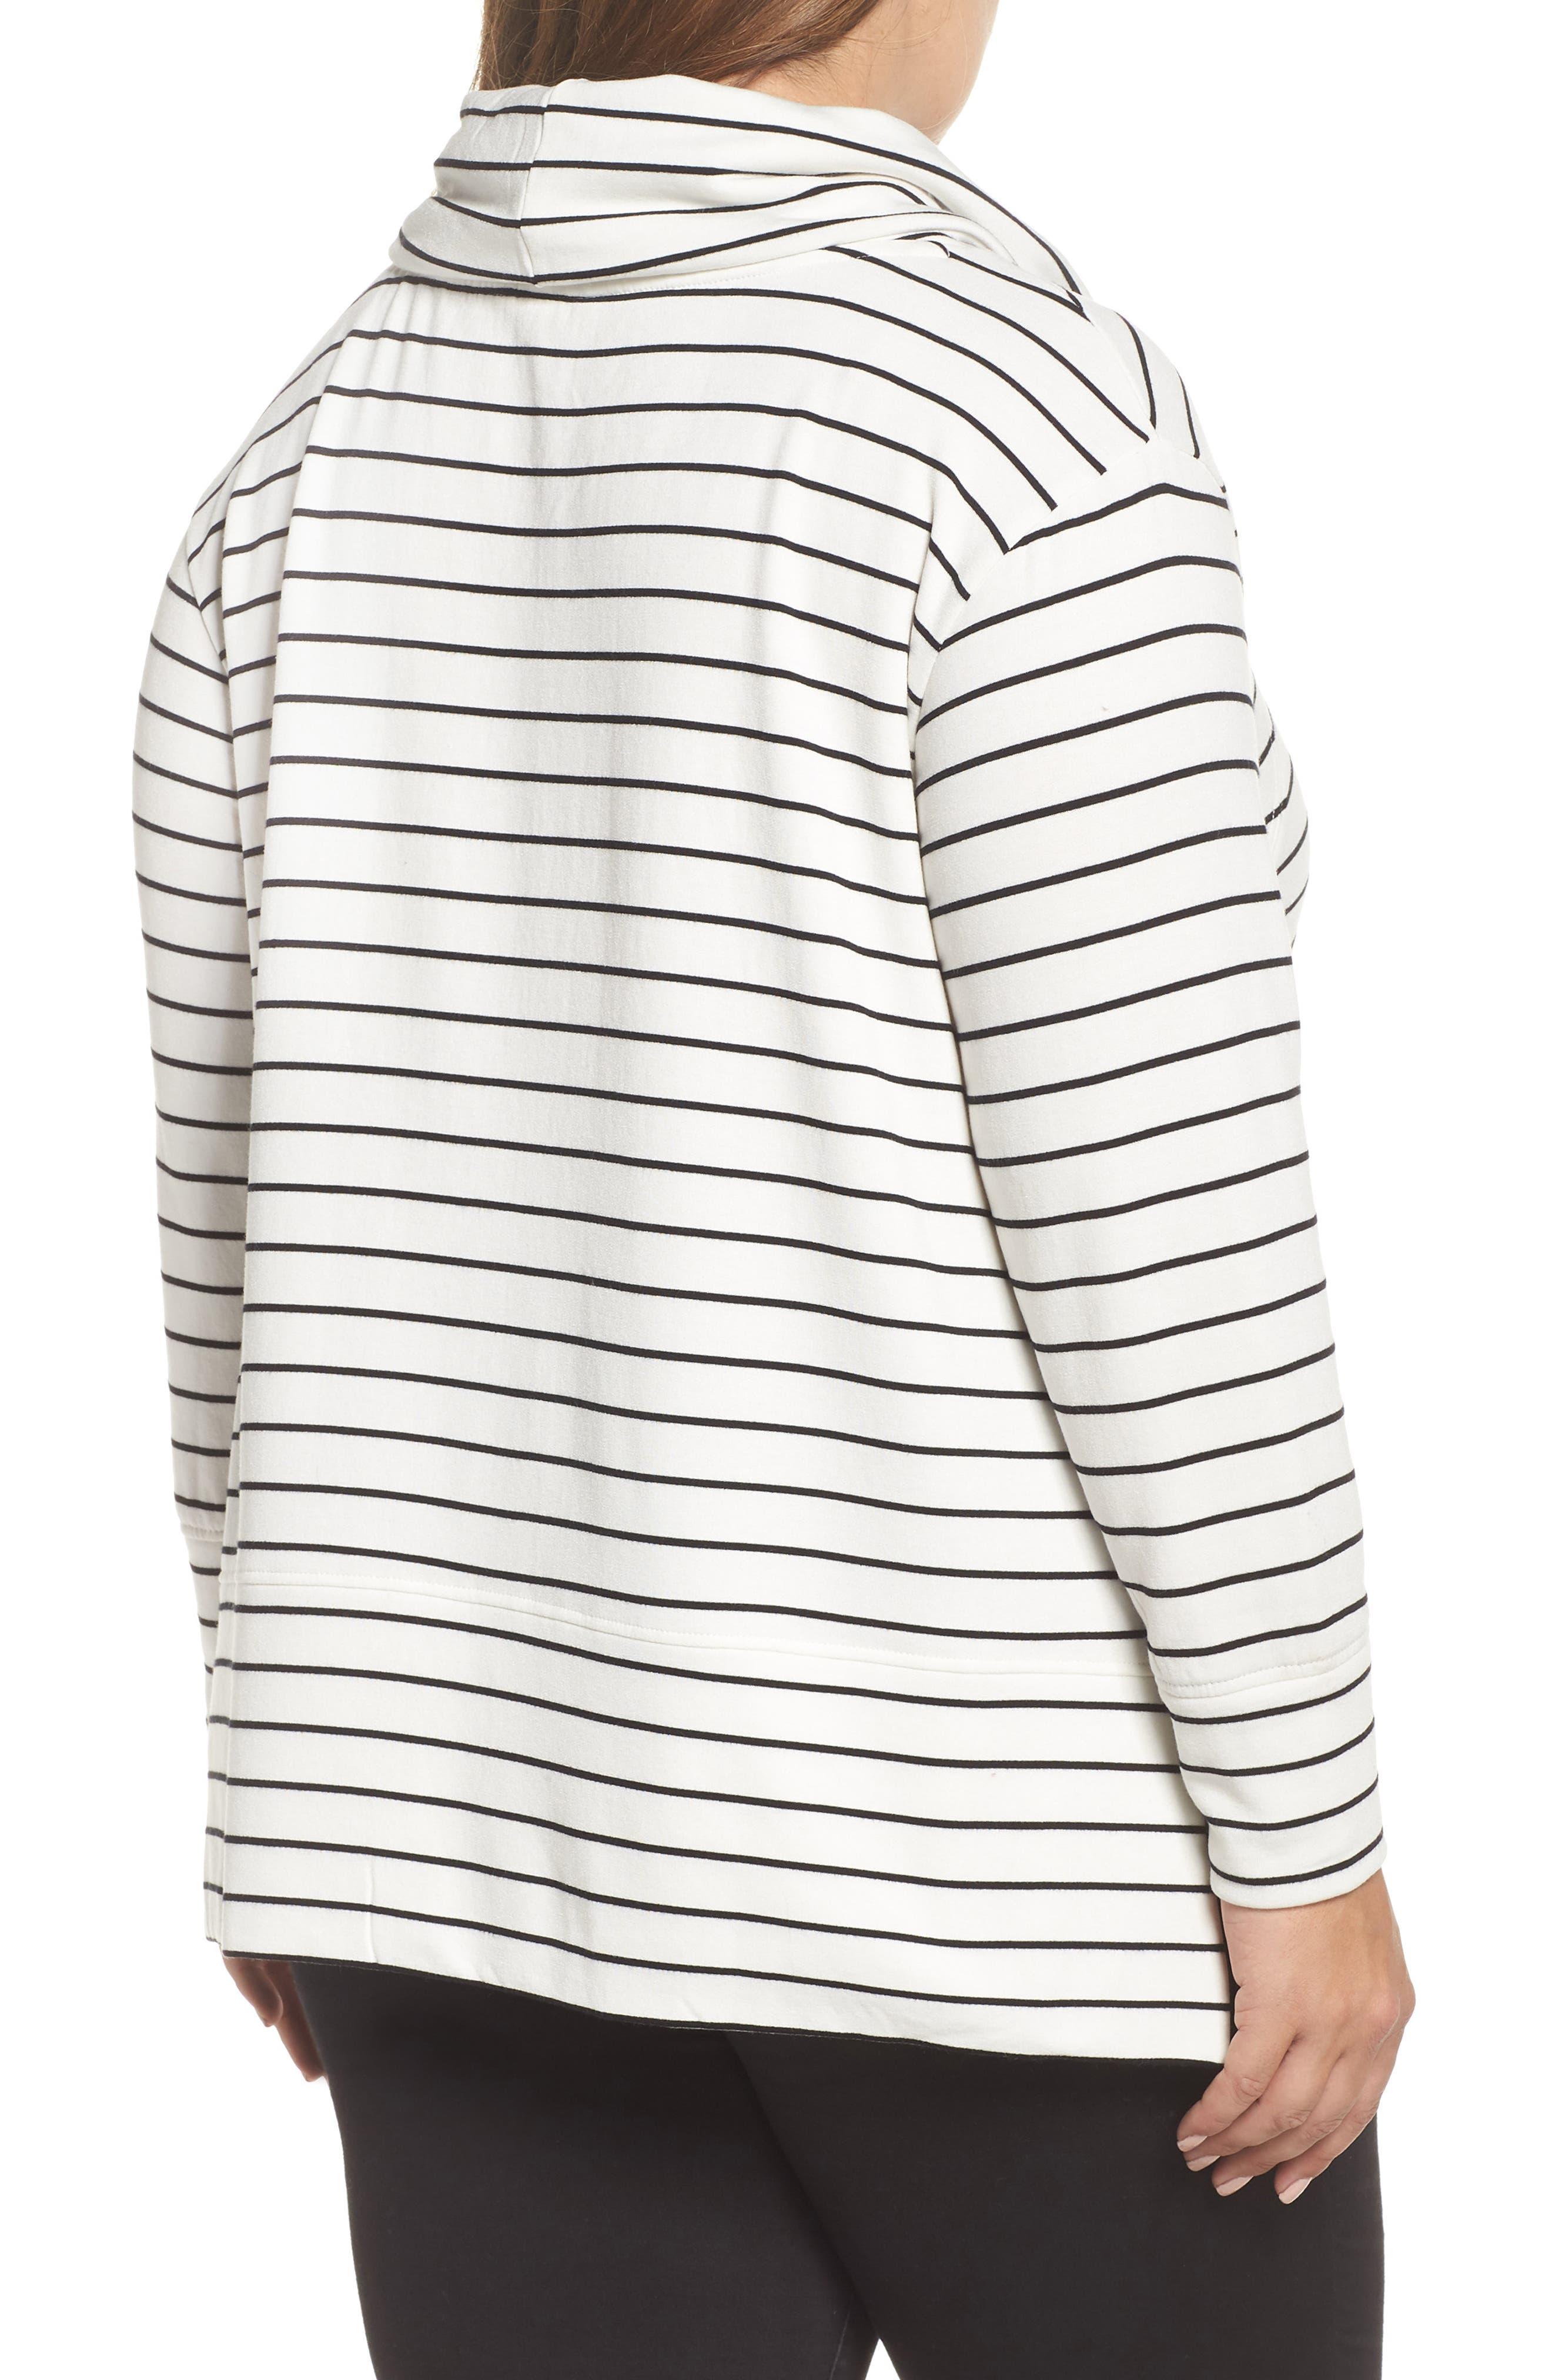 Cowl Neck Tunic Sweatshirt,                             Alternate thumbnail 2, color,                             IVORY- BLACK LUKAH STRIPE